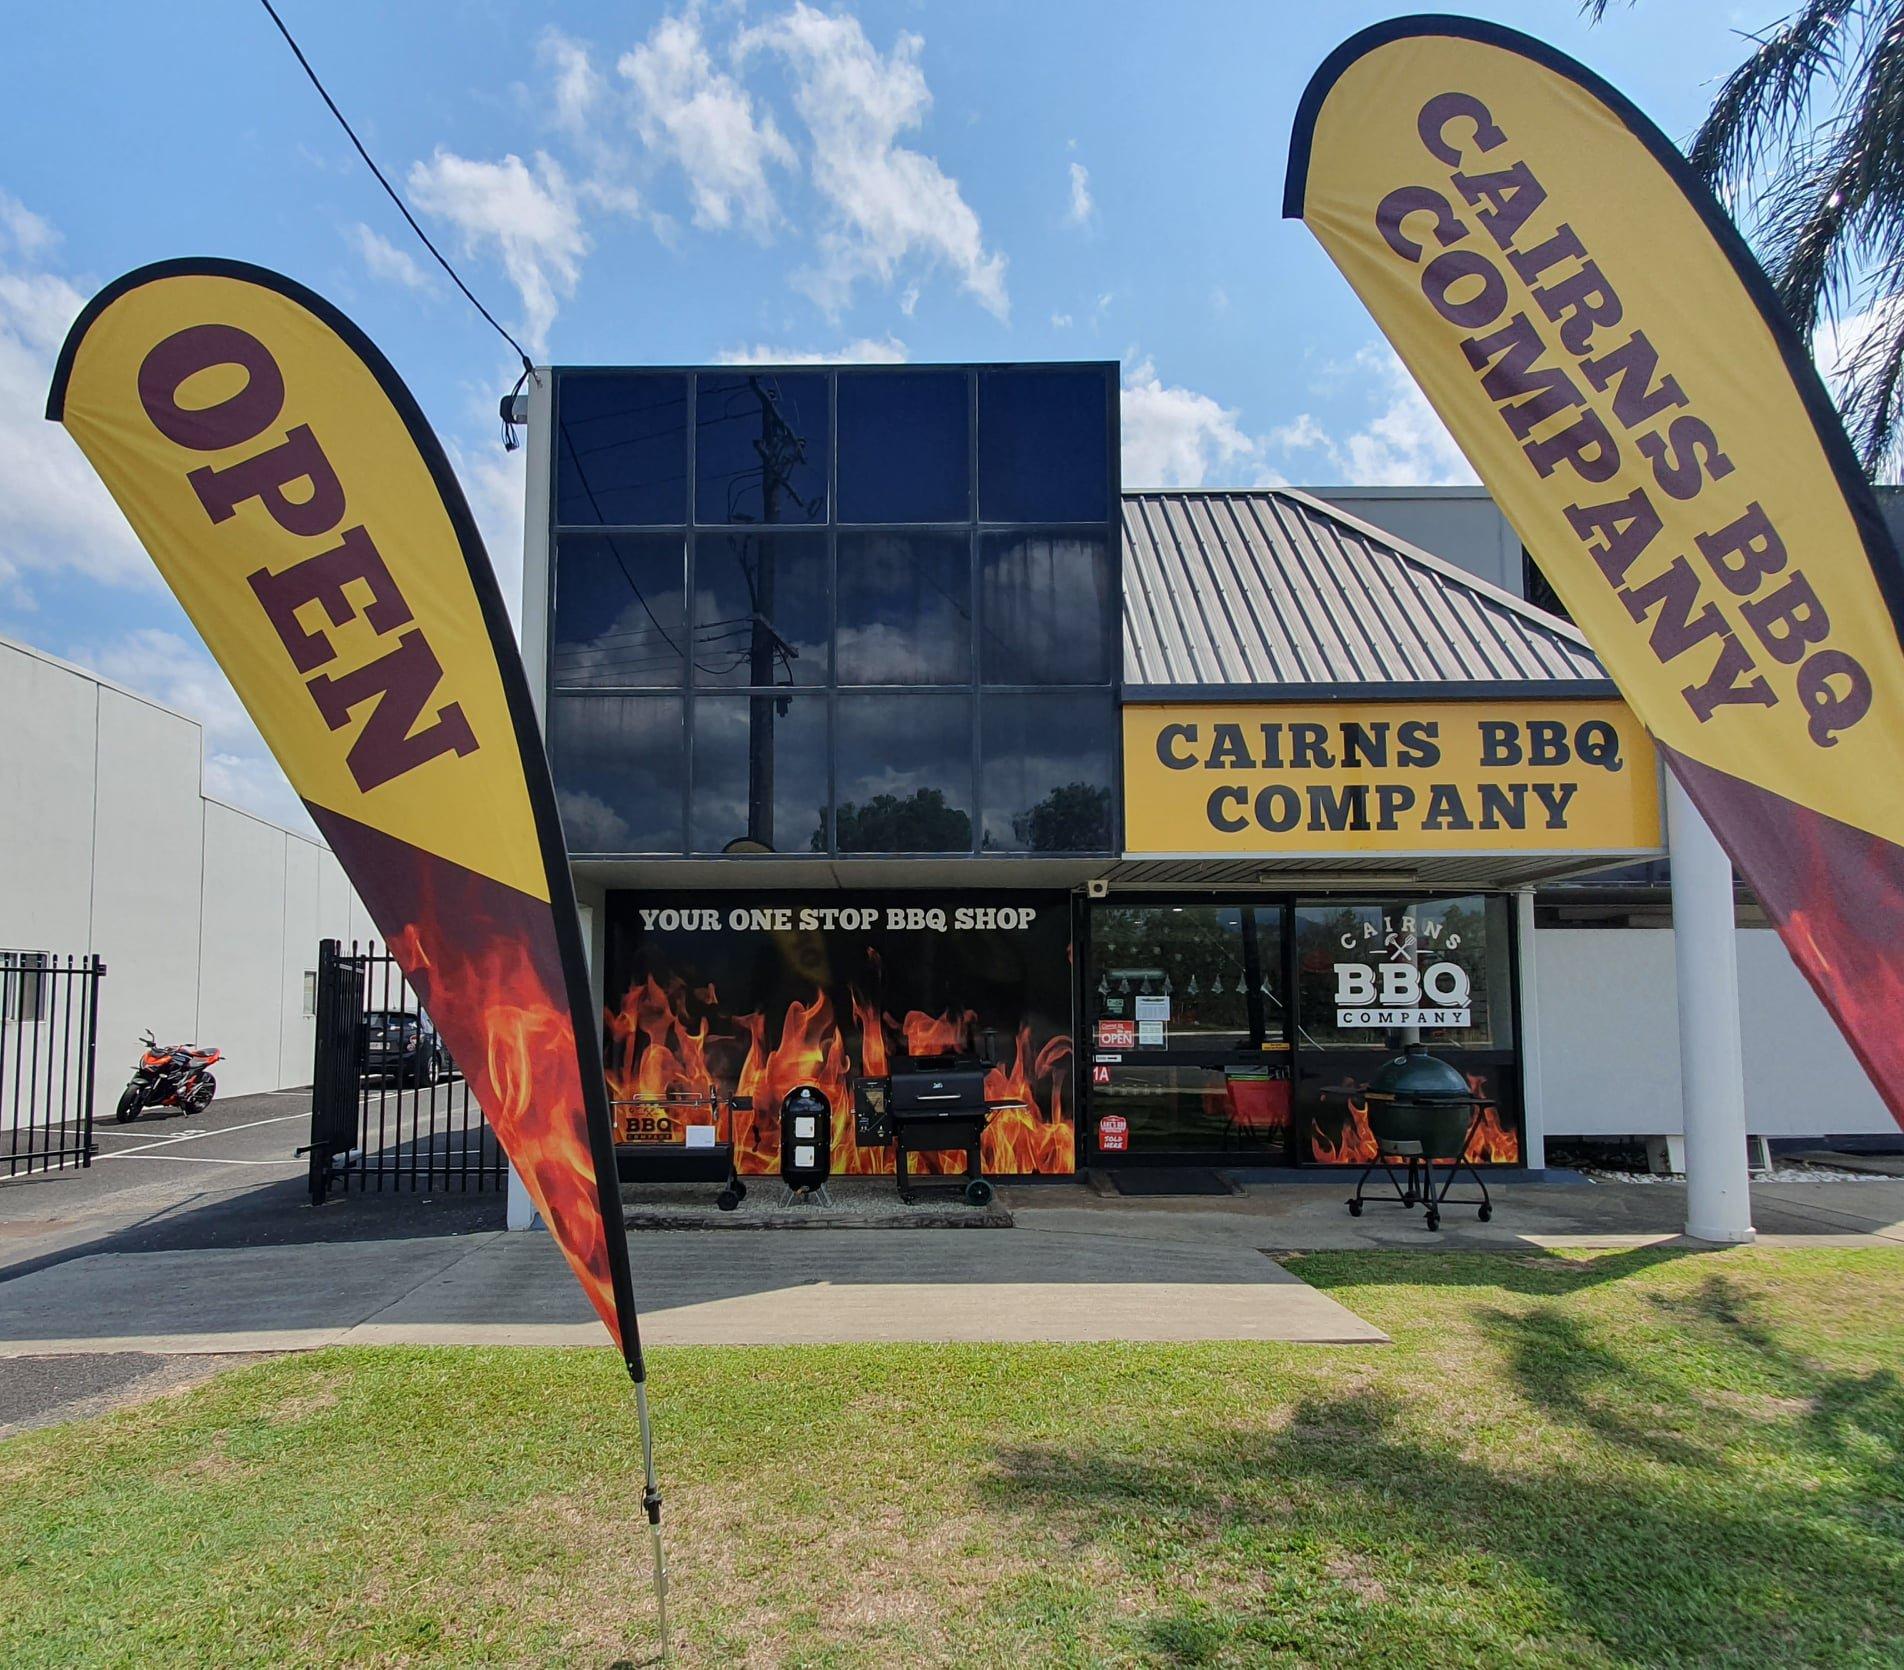 Cairns BBQ Company